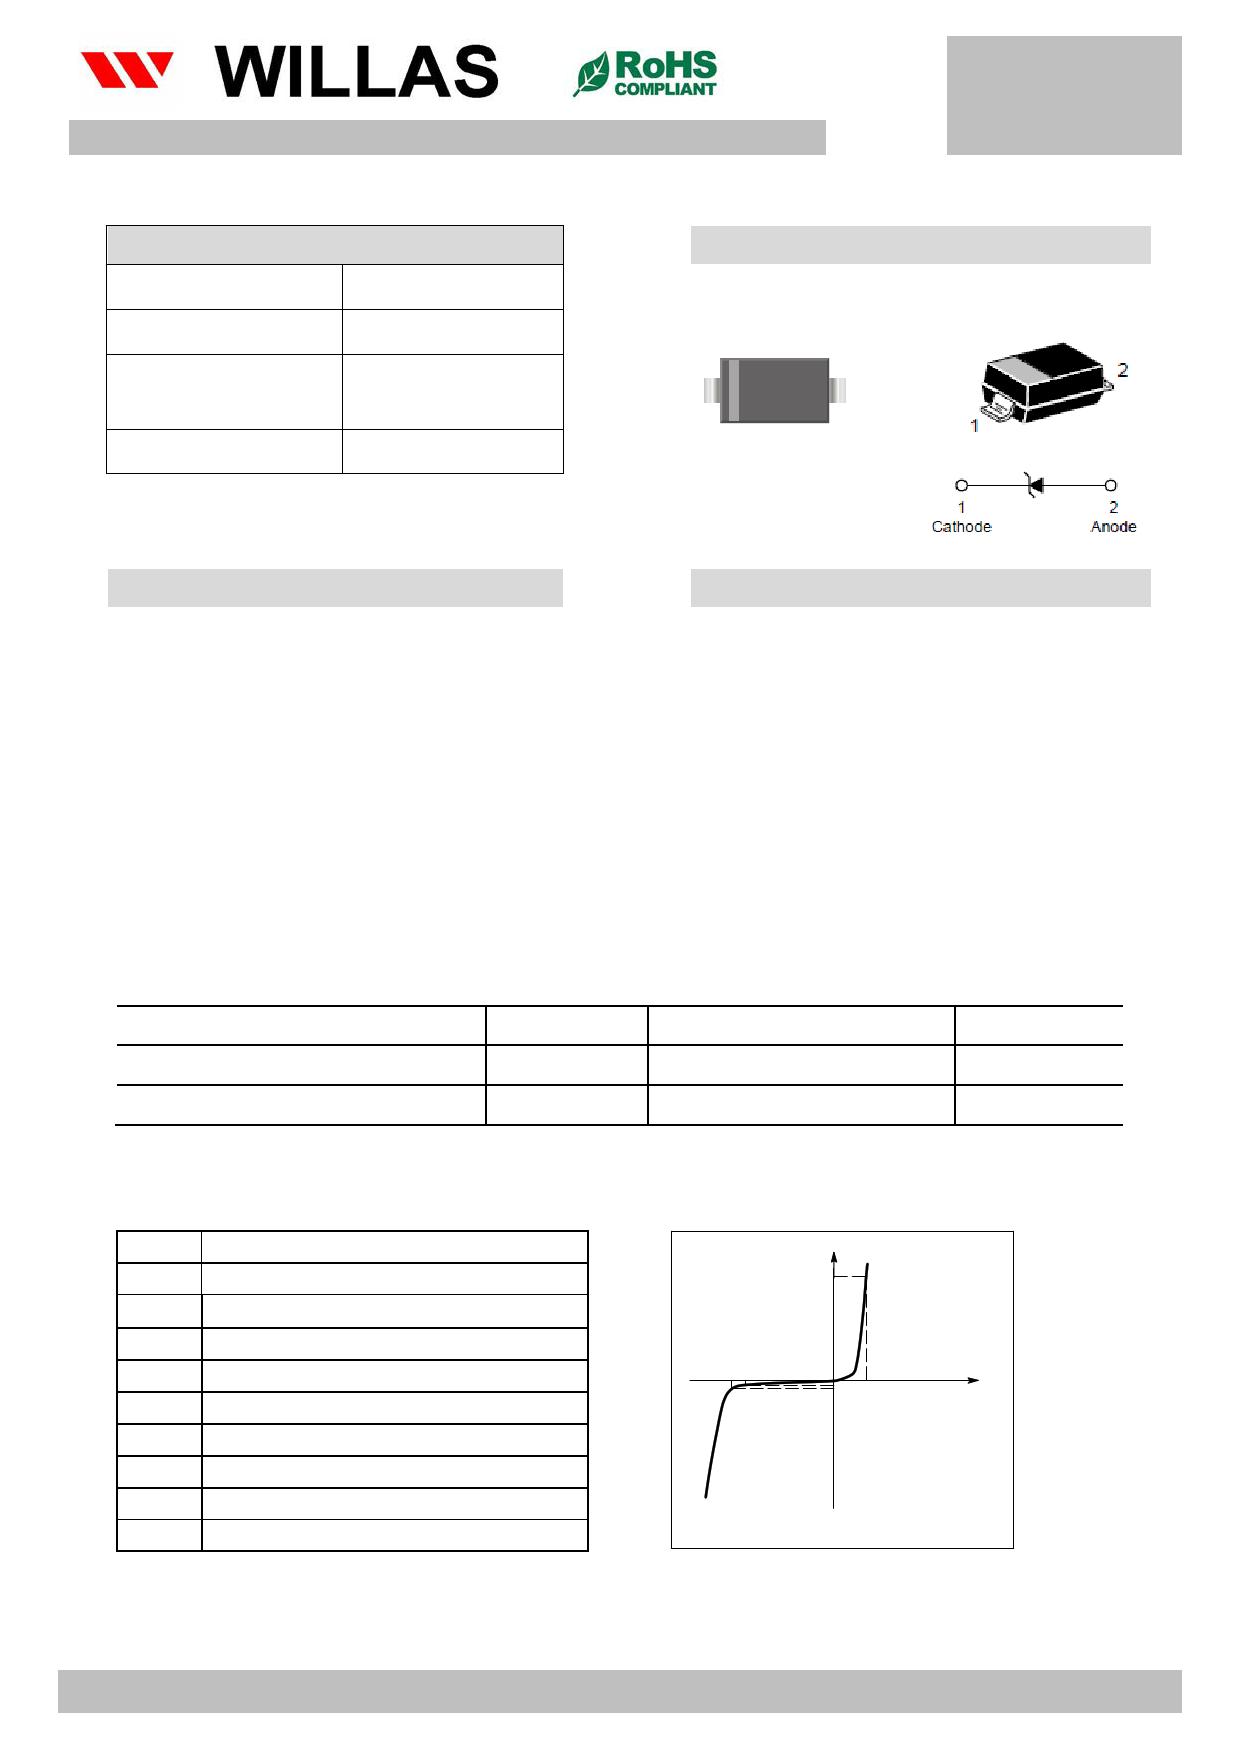 MMSZ5252B Datasheet